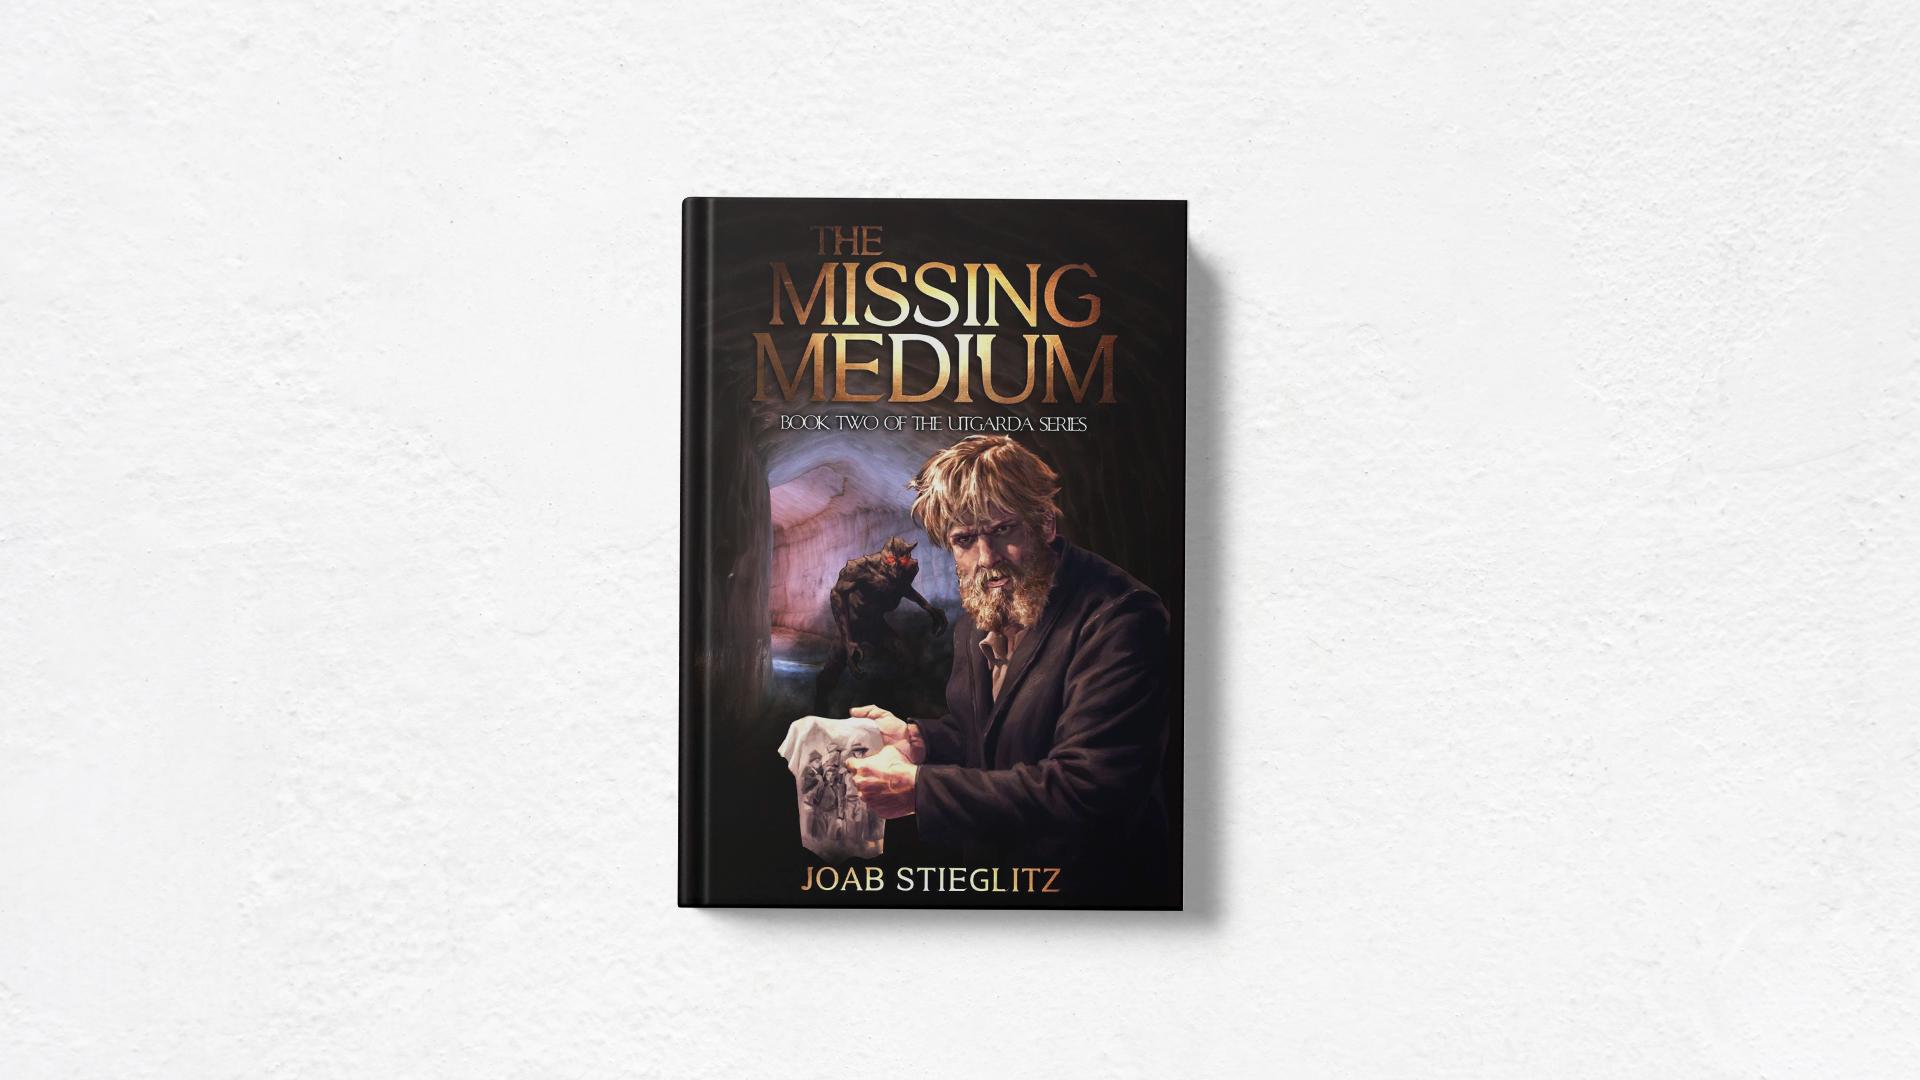 The Missing Medium by Joab Stieglitz book cover